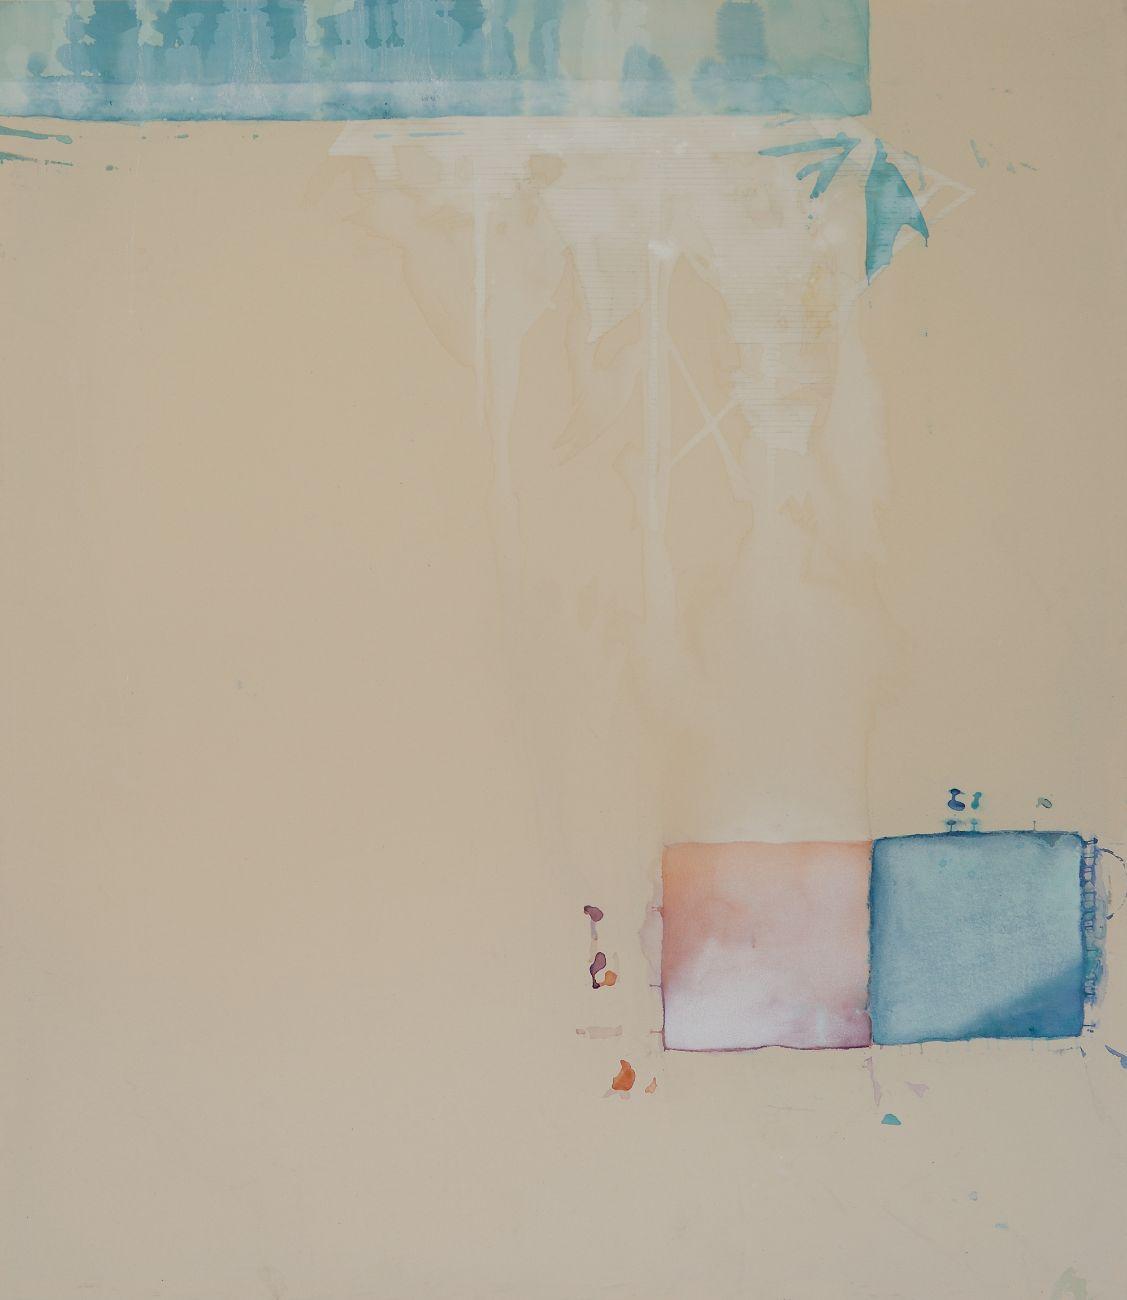 Sail, 165x190cm, mixed media on canvas, 2016